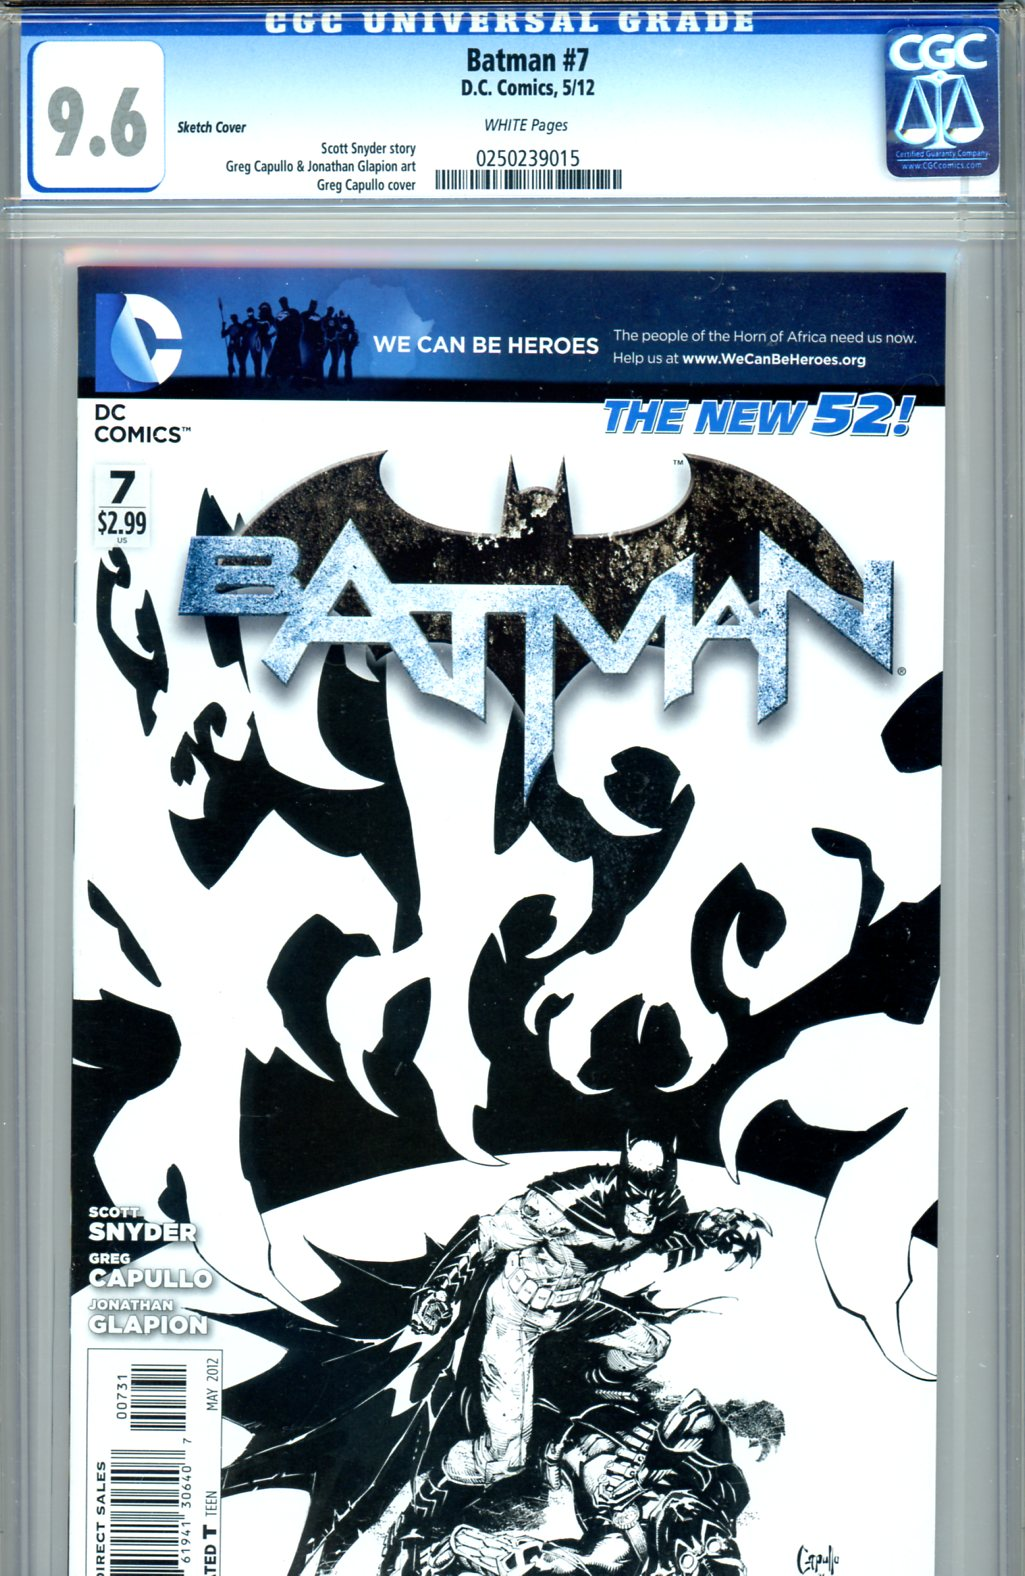 Batman #7 CGC 9.6 w Sketch Cover